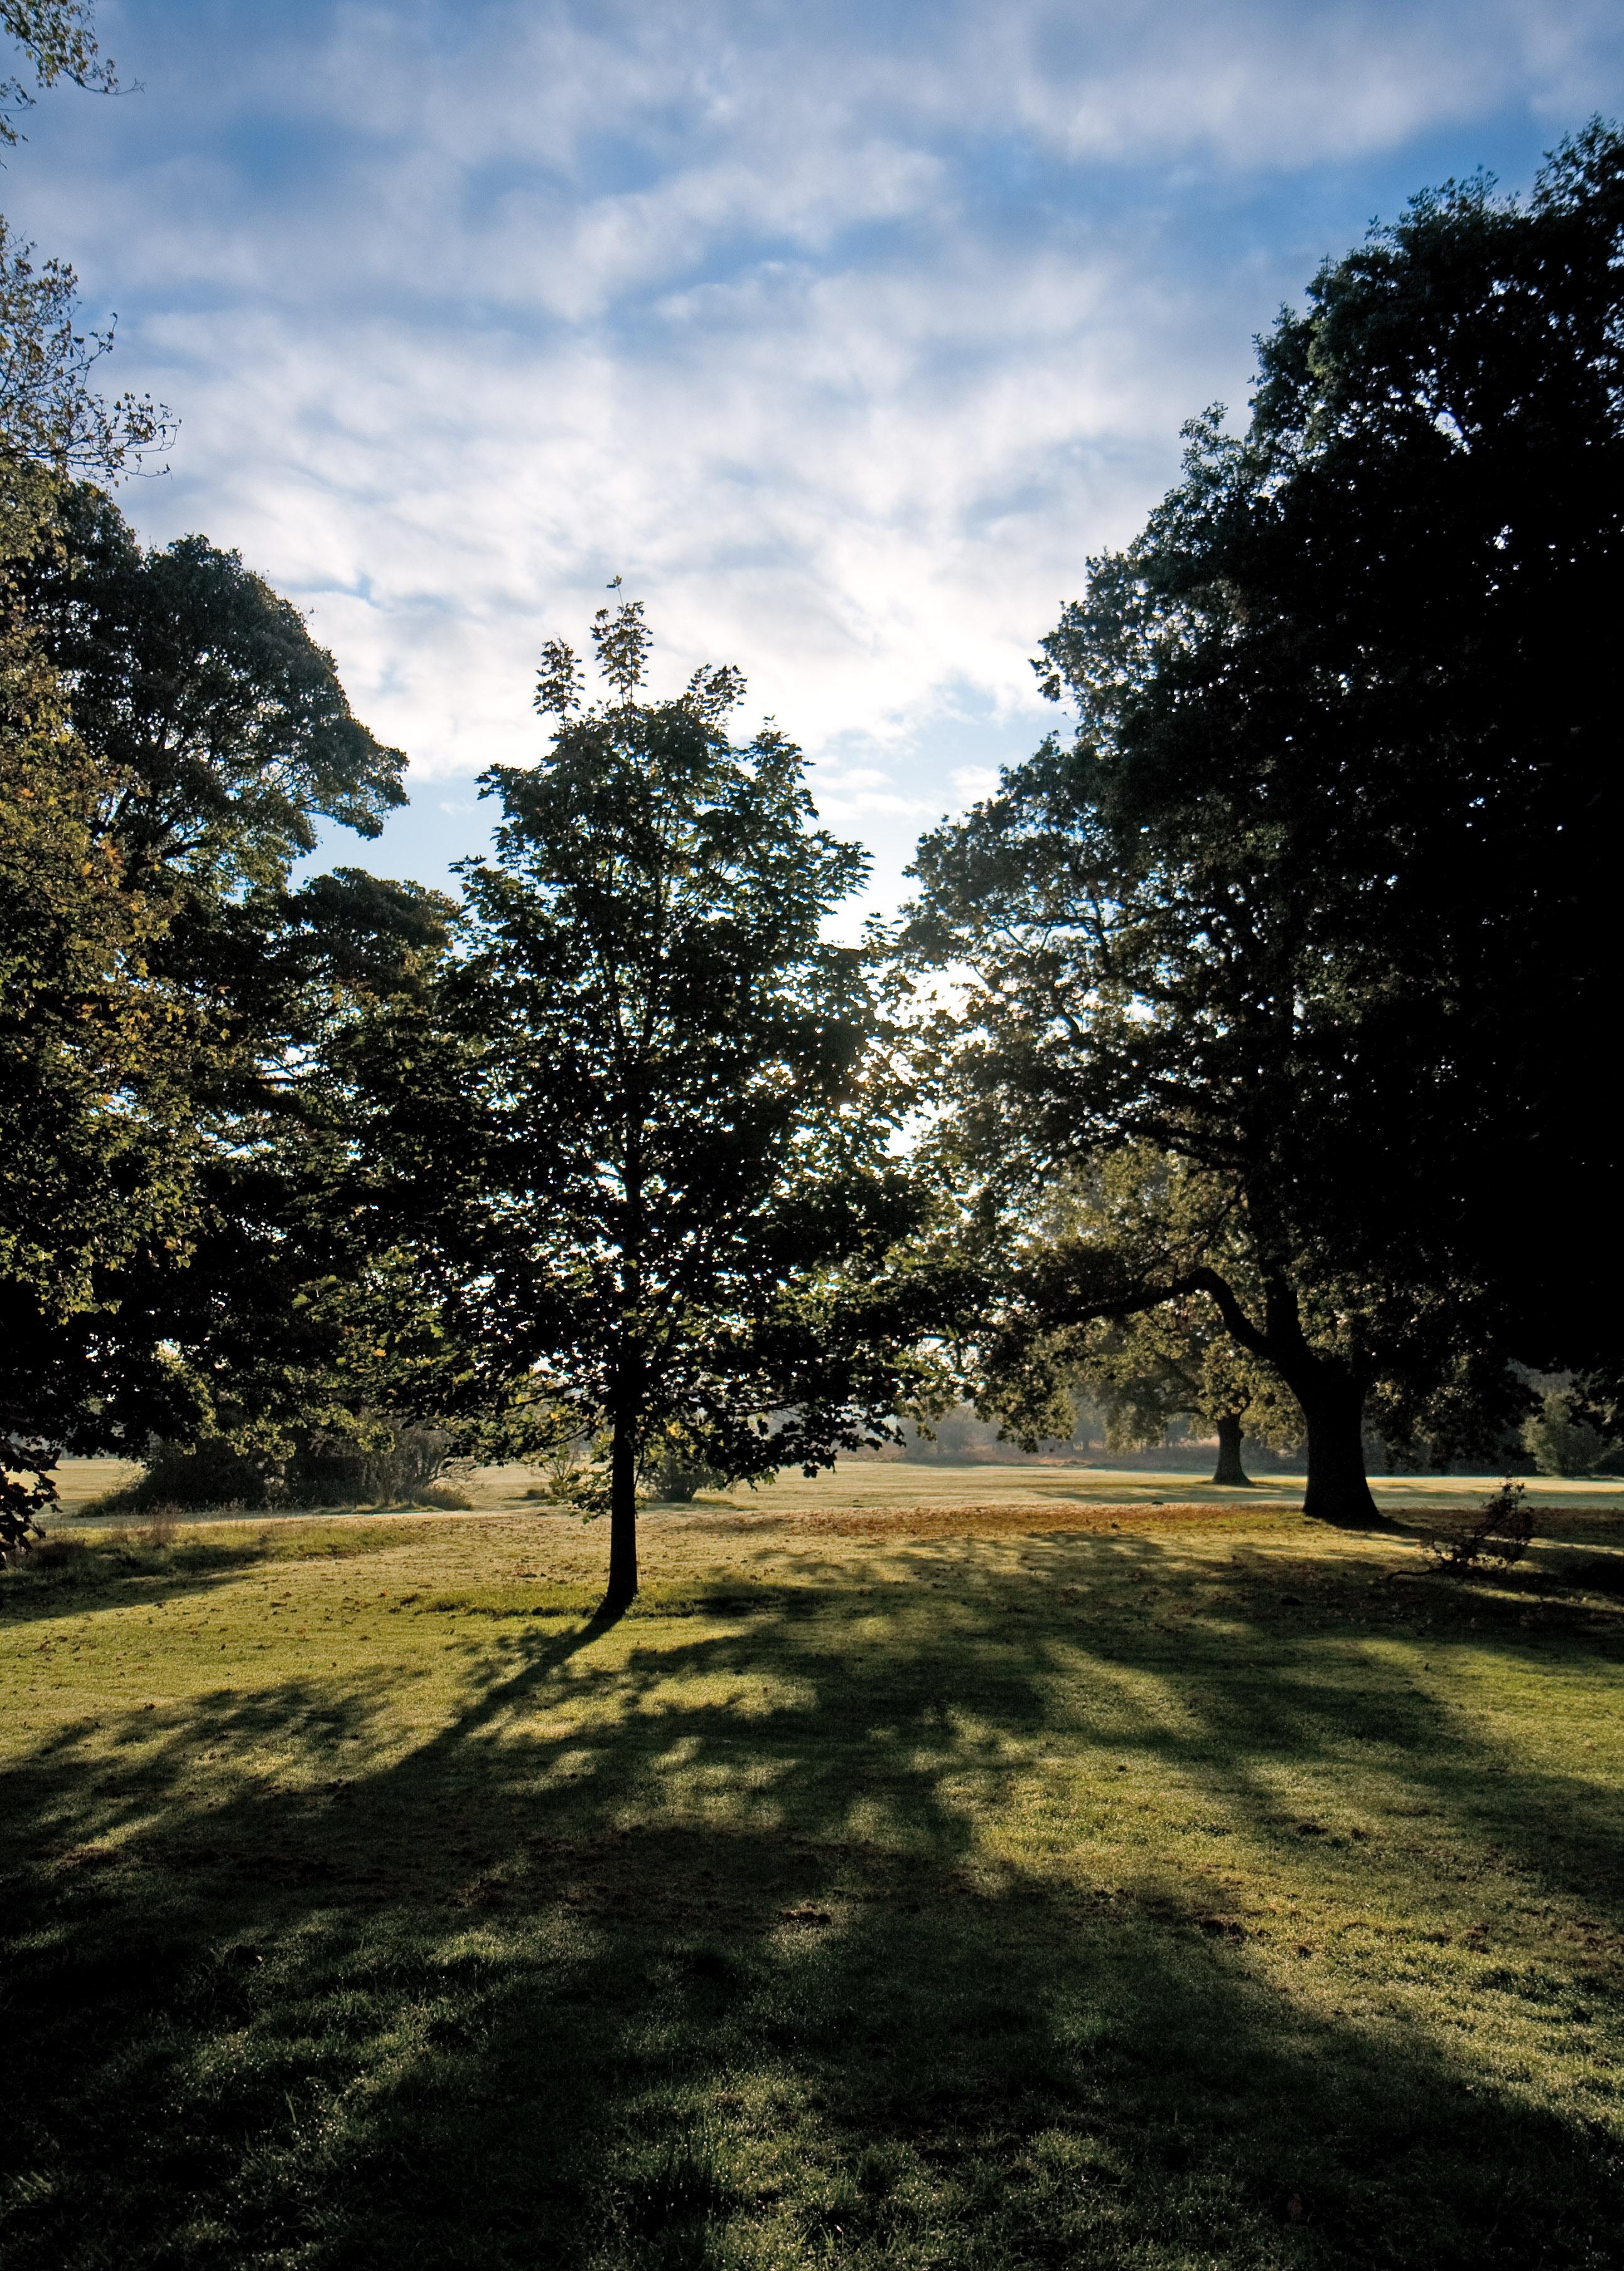 35 The Park